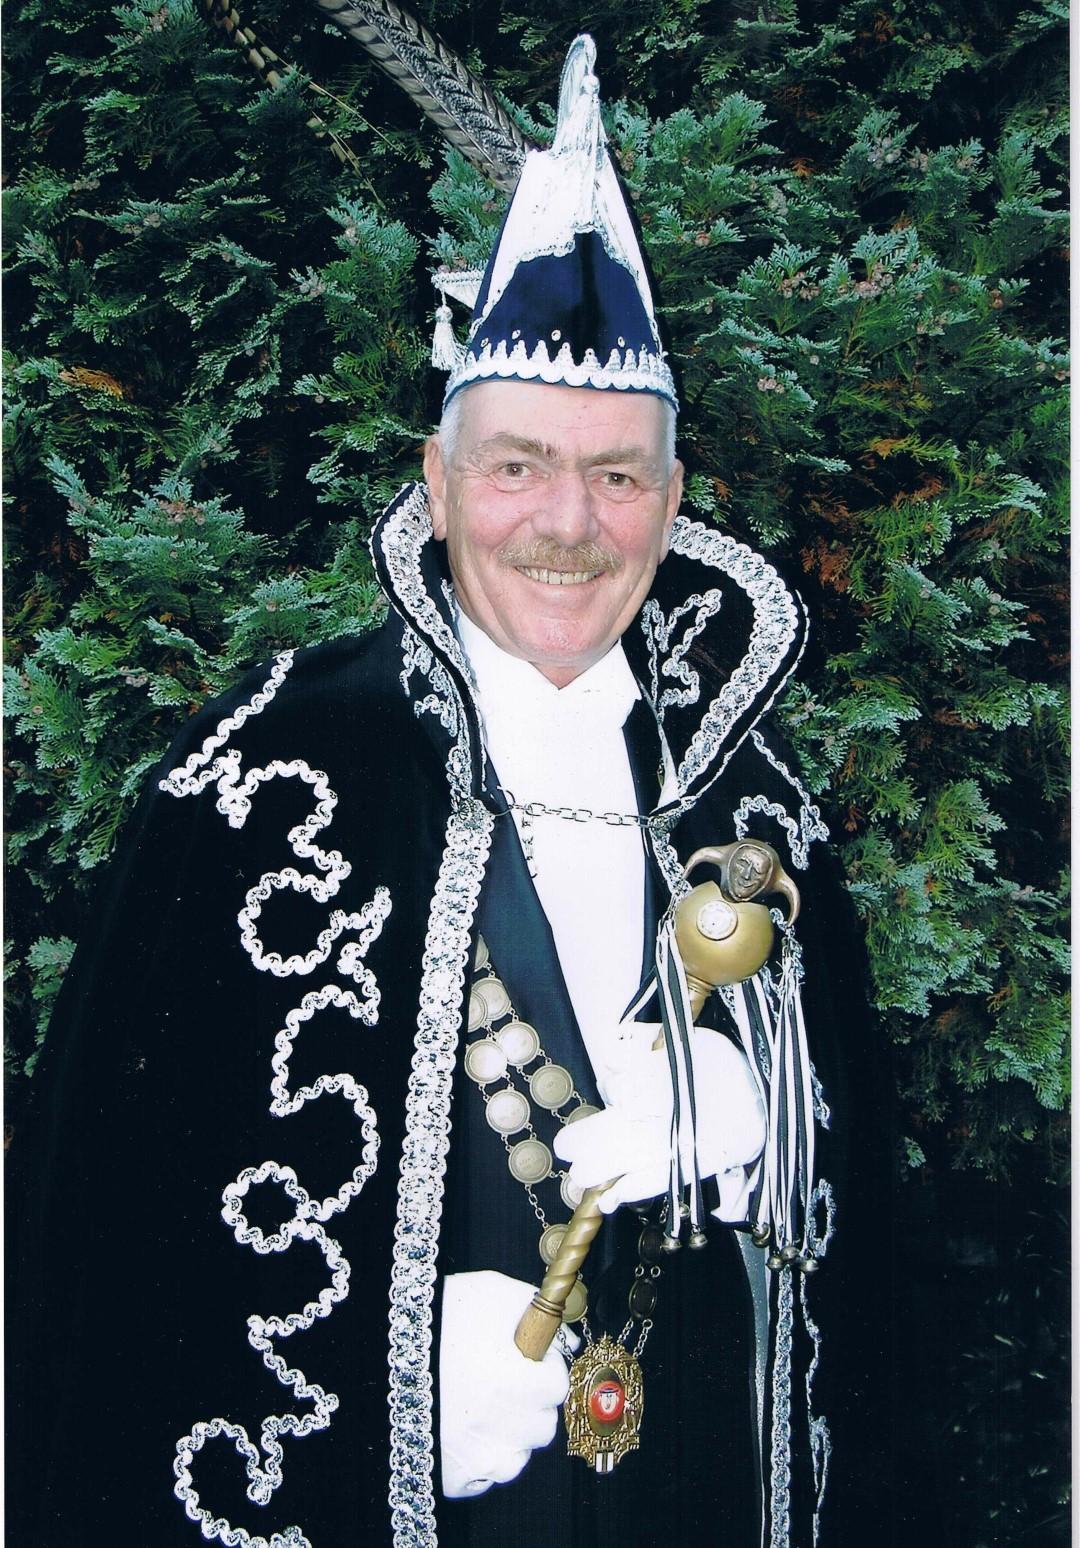 2006 2007 Prins Rien de 2e Rien Klapwijk